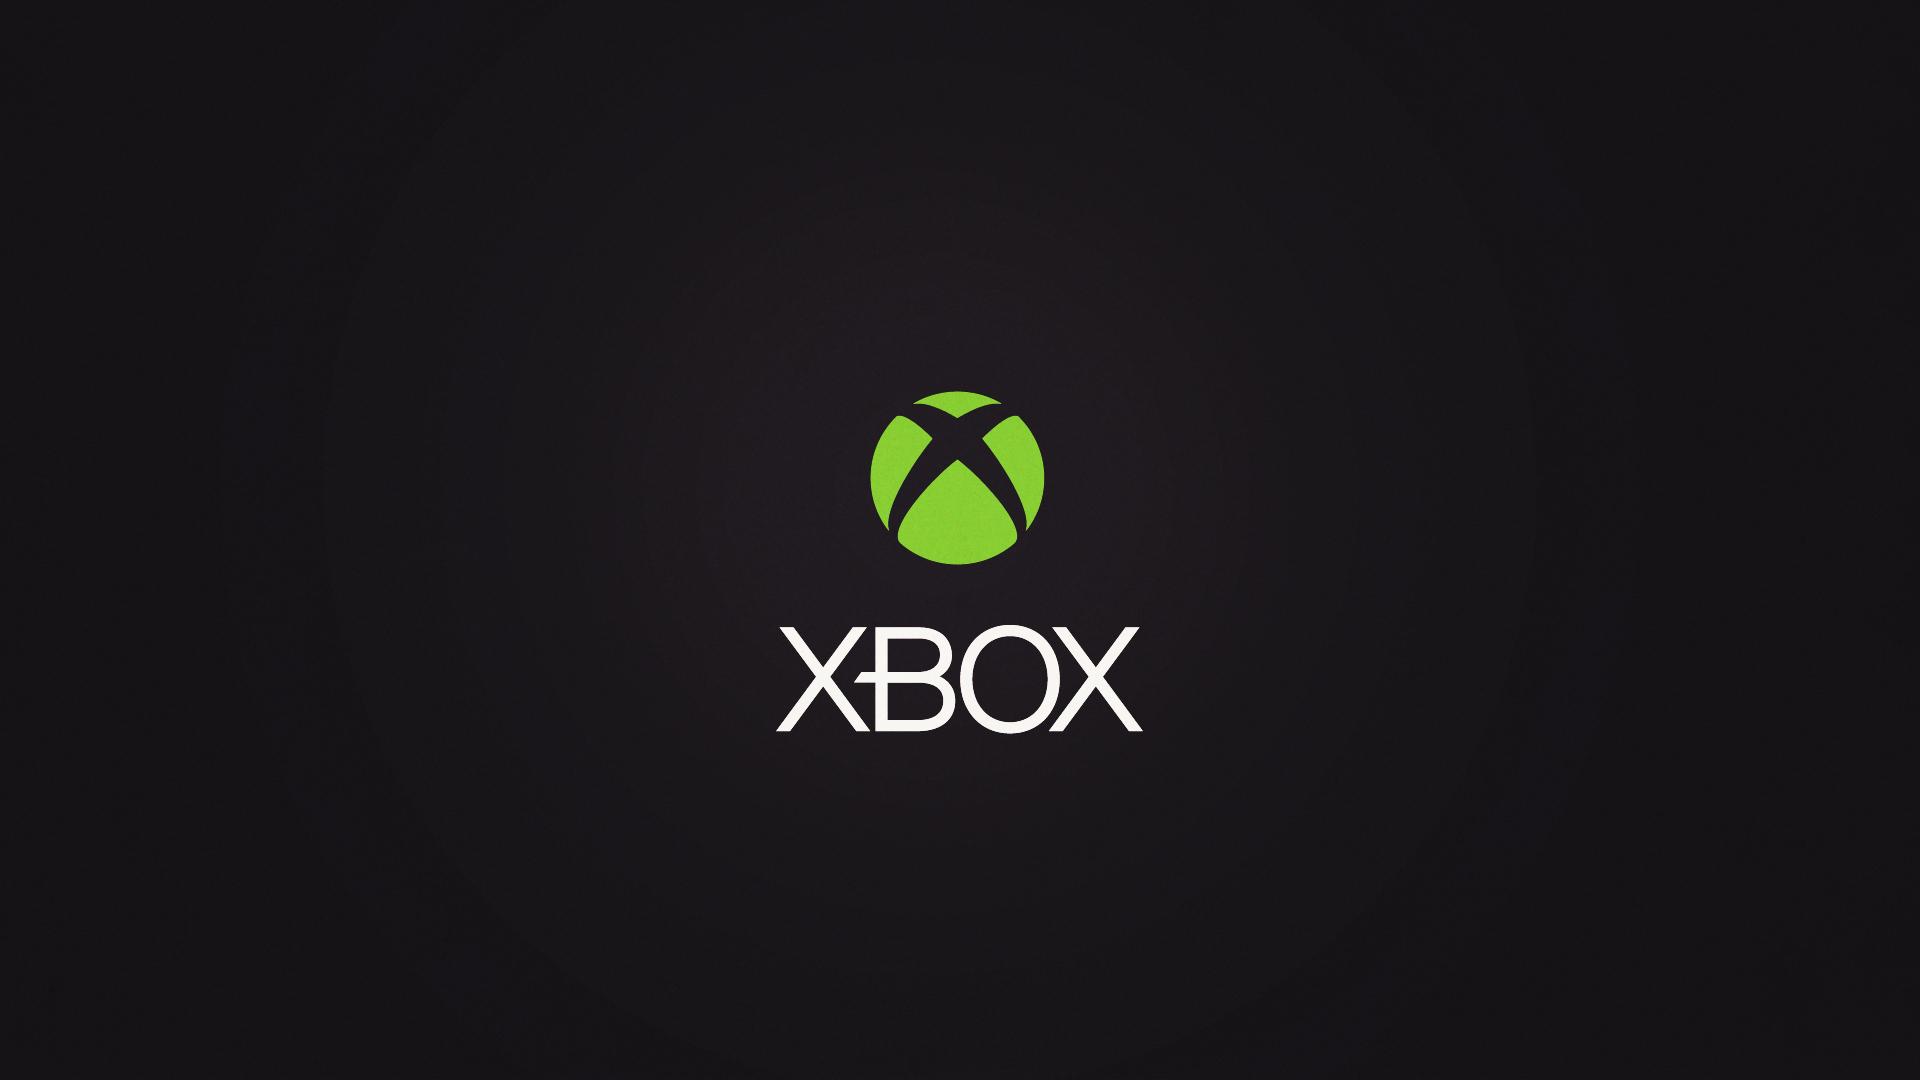 Buck - 2013 - Xbox Pitch Frame 20.jpg